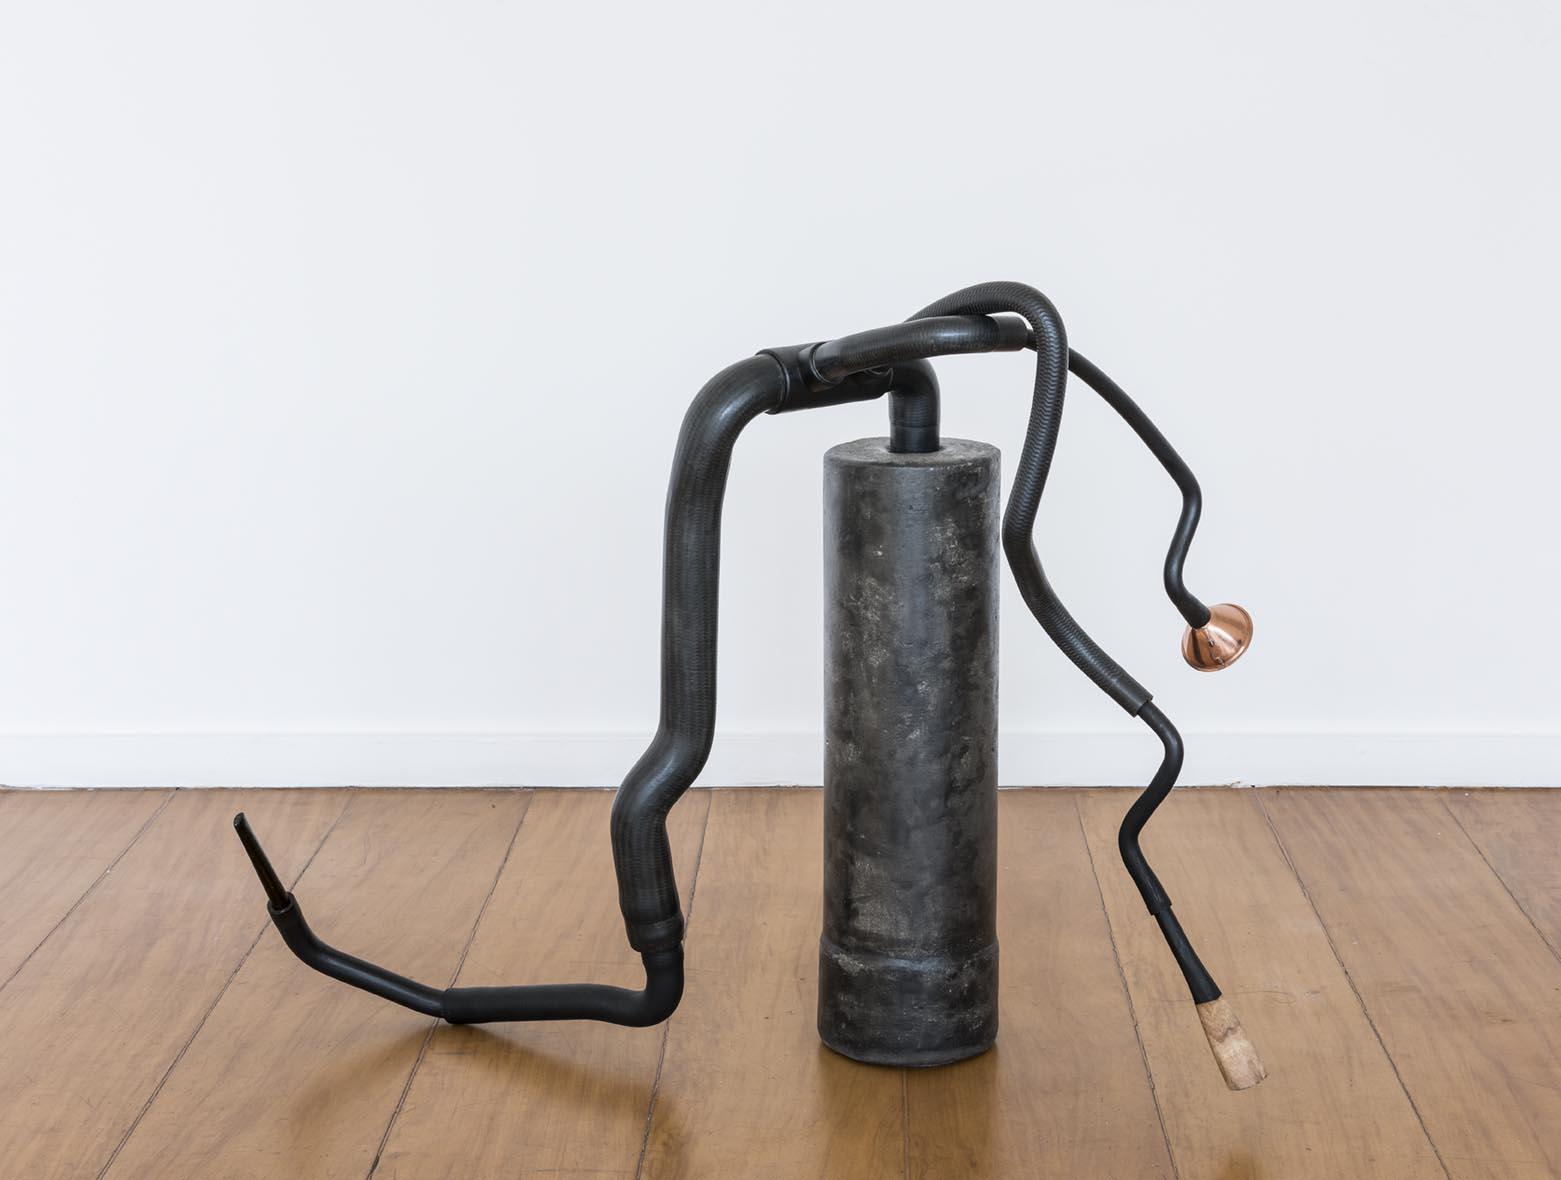 Claudio Cretti  Sem título    Untitled,  2017 Cimento, madeira, borracha, tinta óleo e piteira   Cement, wood, rubber, oil paint and cigarette holder, 66 x 86 x 40 cm